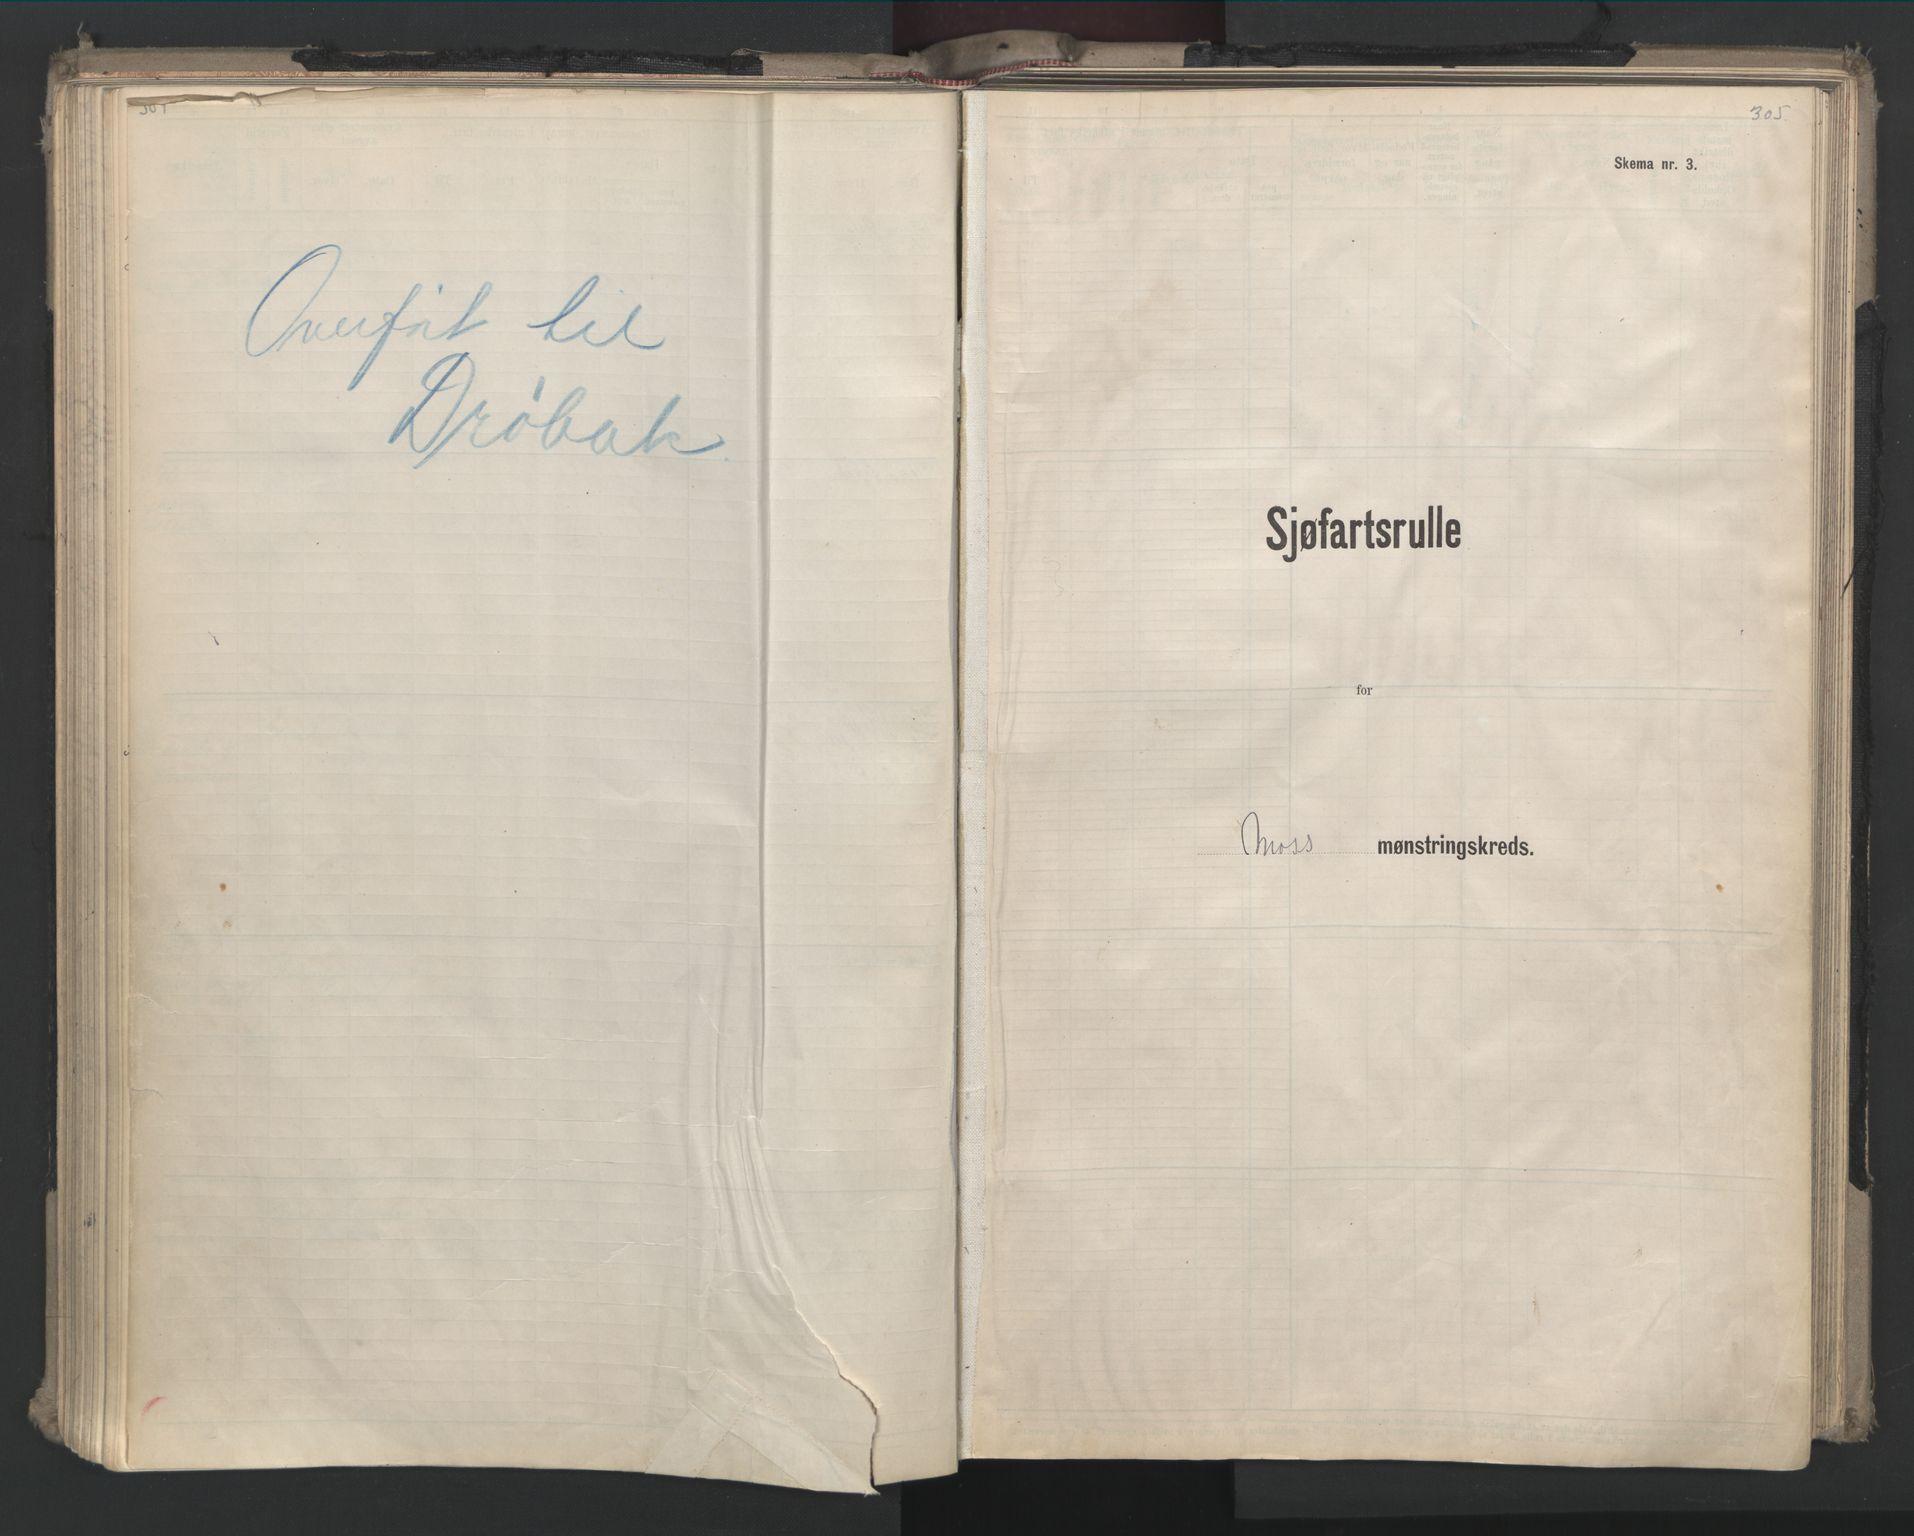 SAO, Oslo sjømannskontor, F/Fd/L0008: B-rulle, 1914, s. 304-305